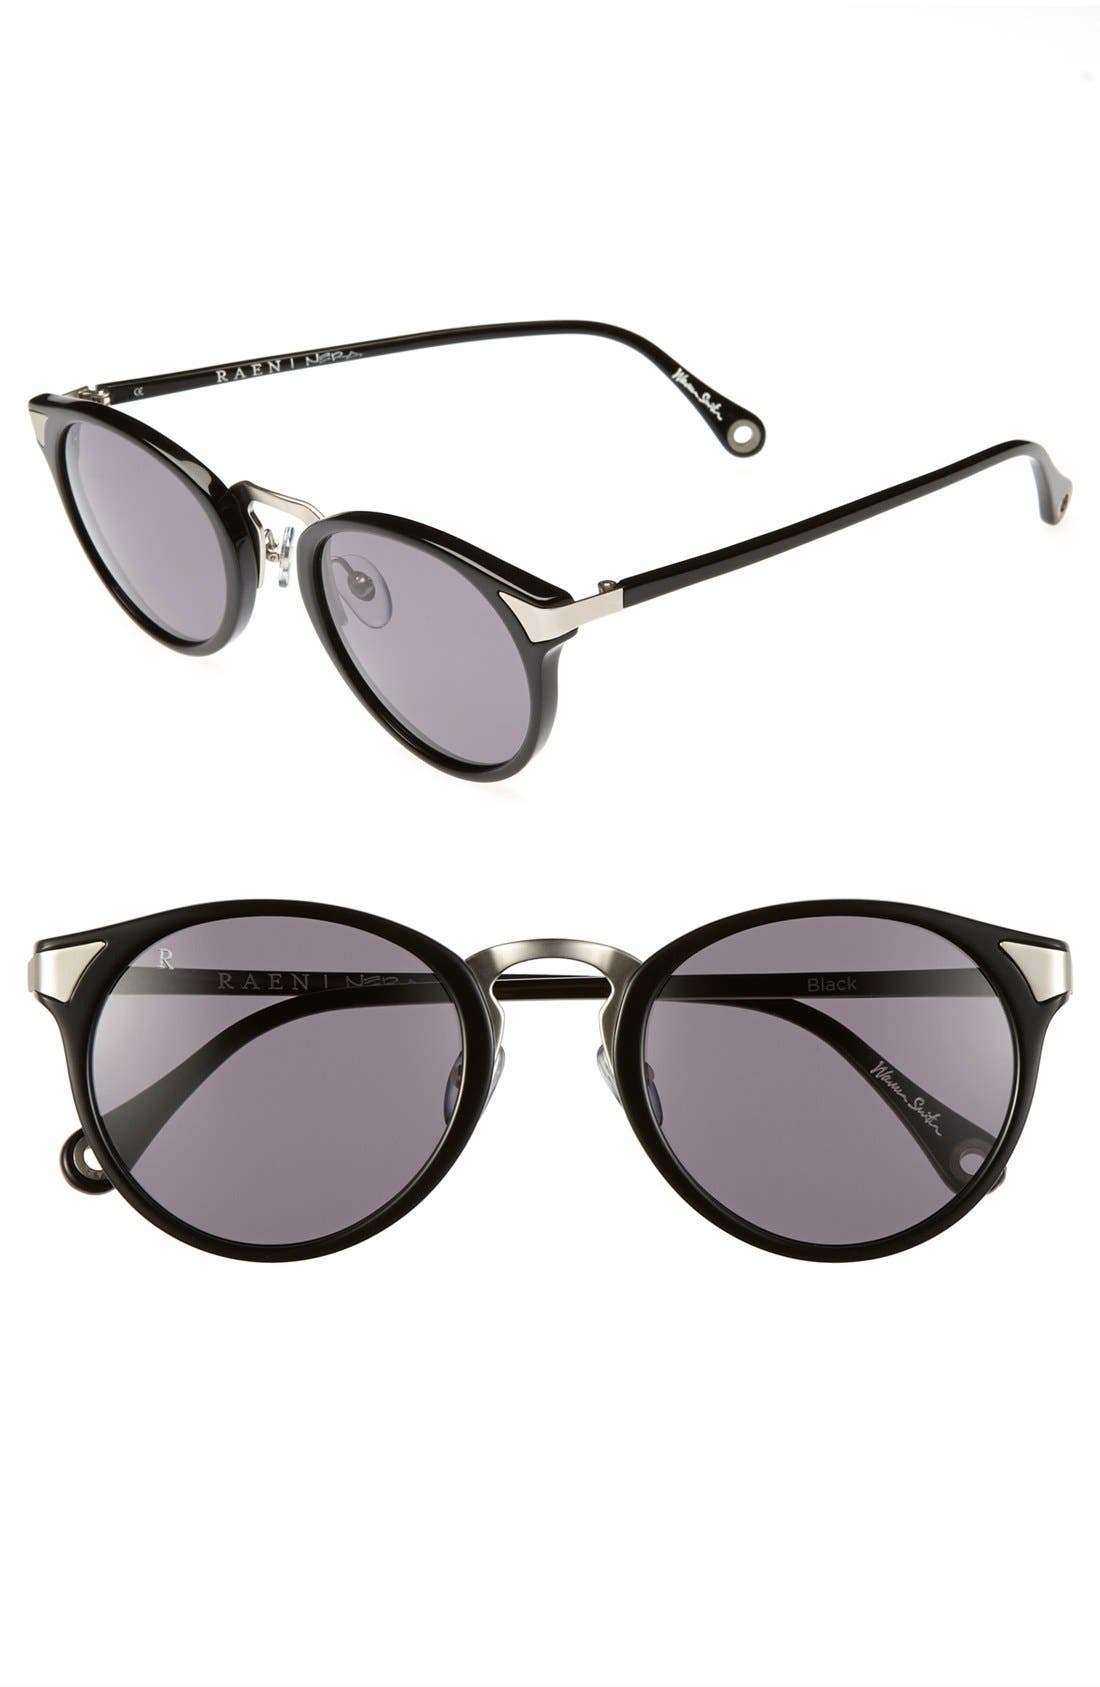 Alternate Image 1 Selected - RAEN 'Nera' 52mm Sunglasses